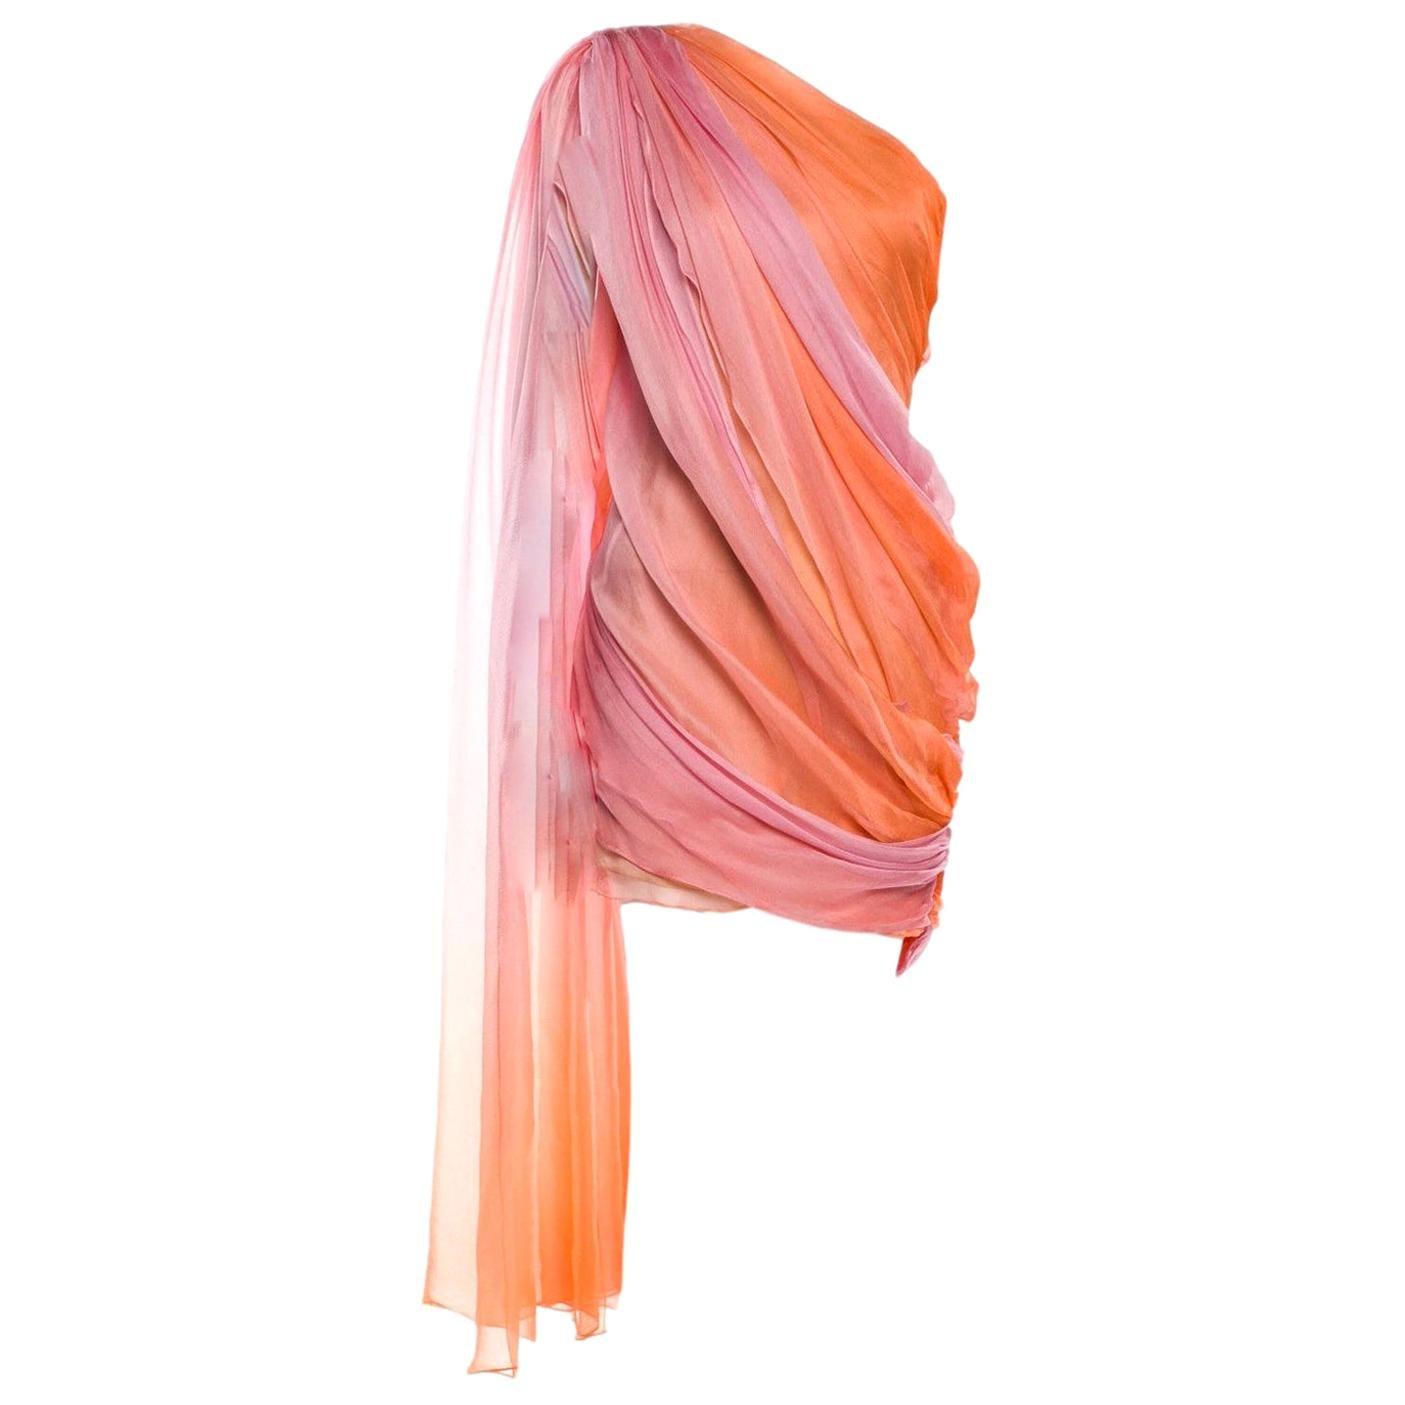 New Oscar De La Renta 2020 Silk AD Runway Dress $4690 W Tags 6